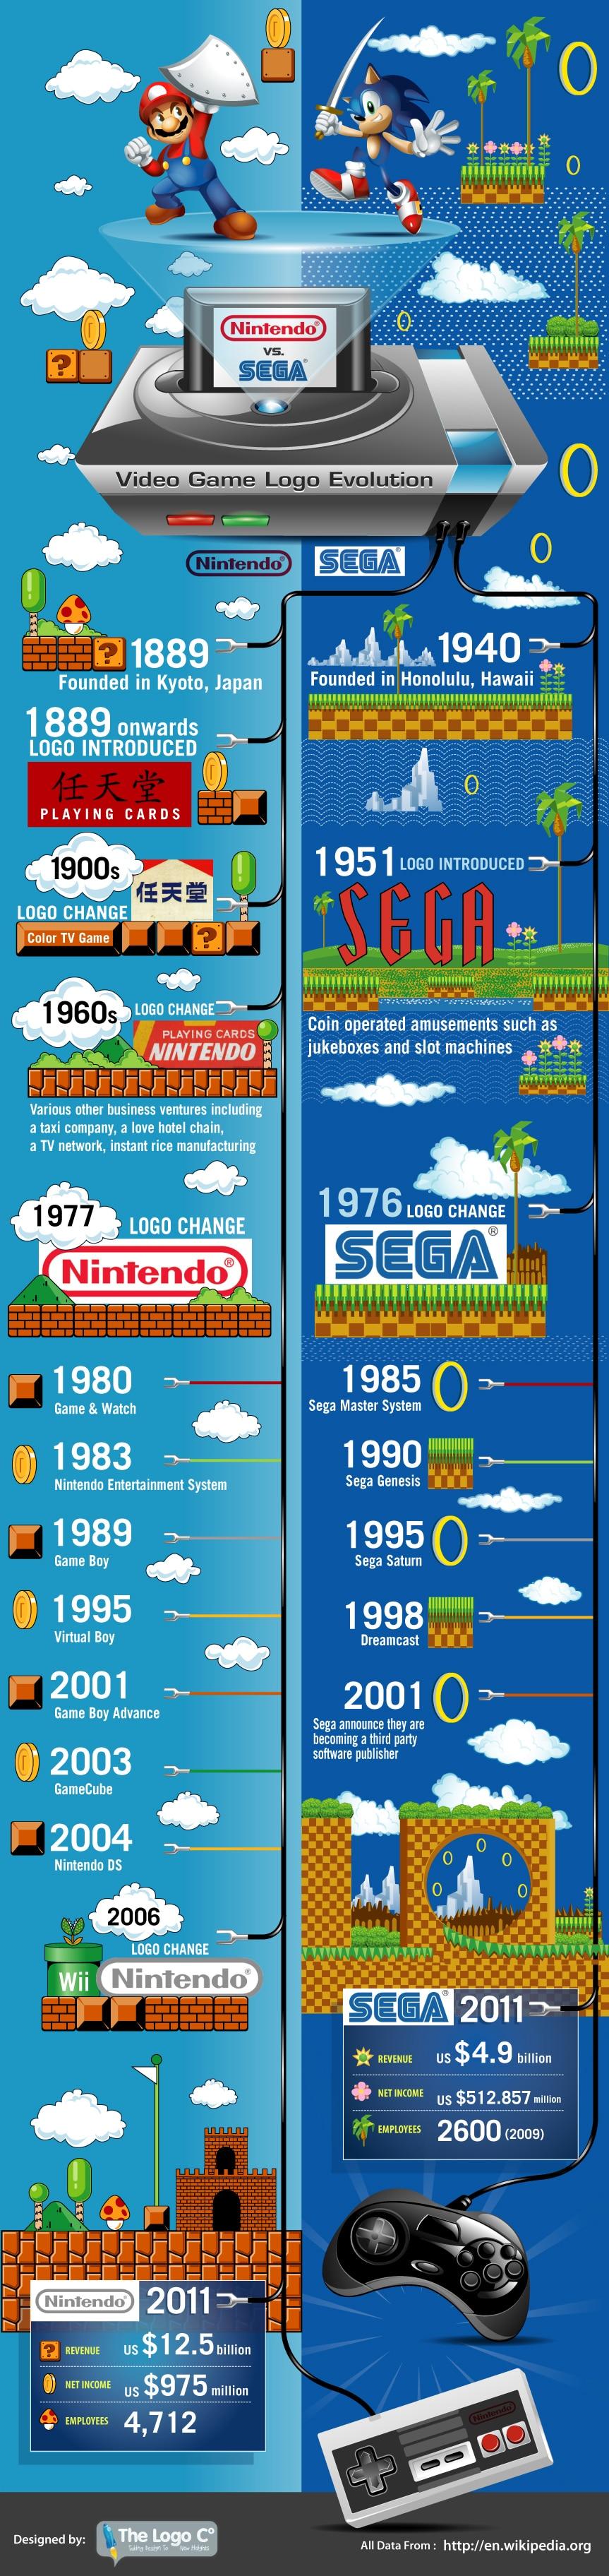 Logo Evolutions: Nintendo vs. SEGA [Infographic]